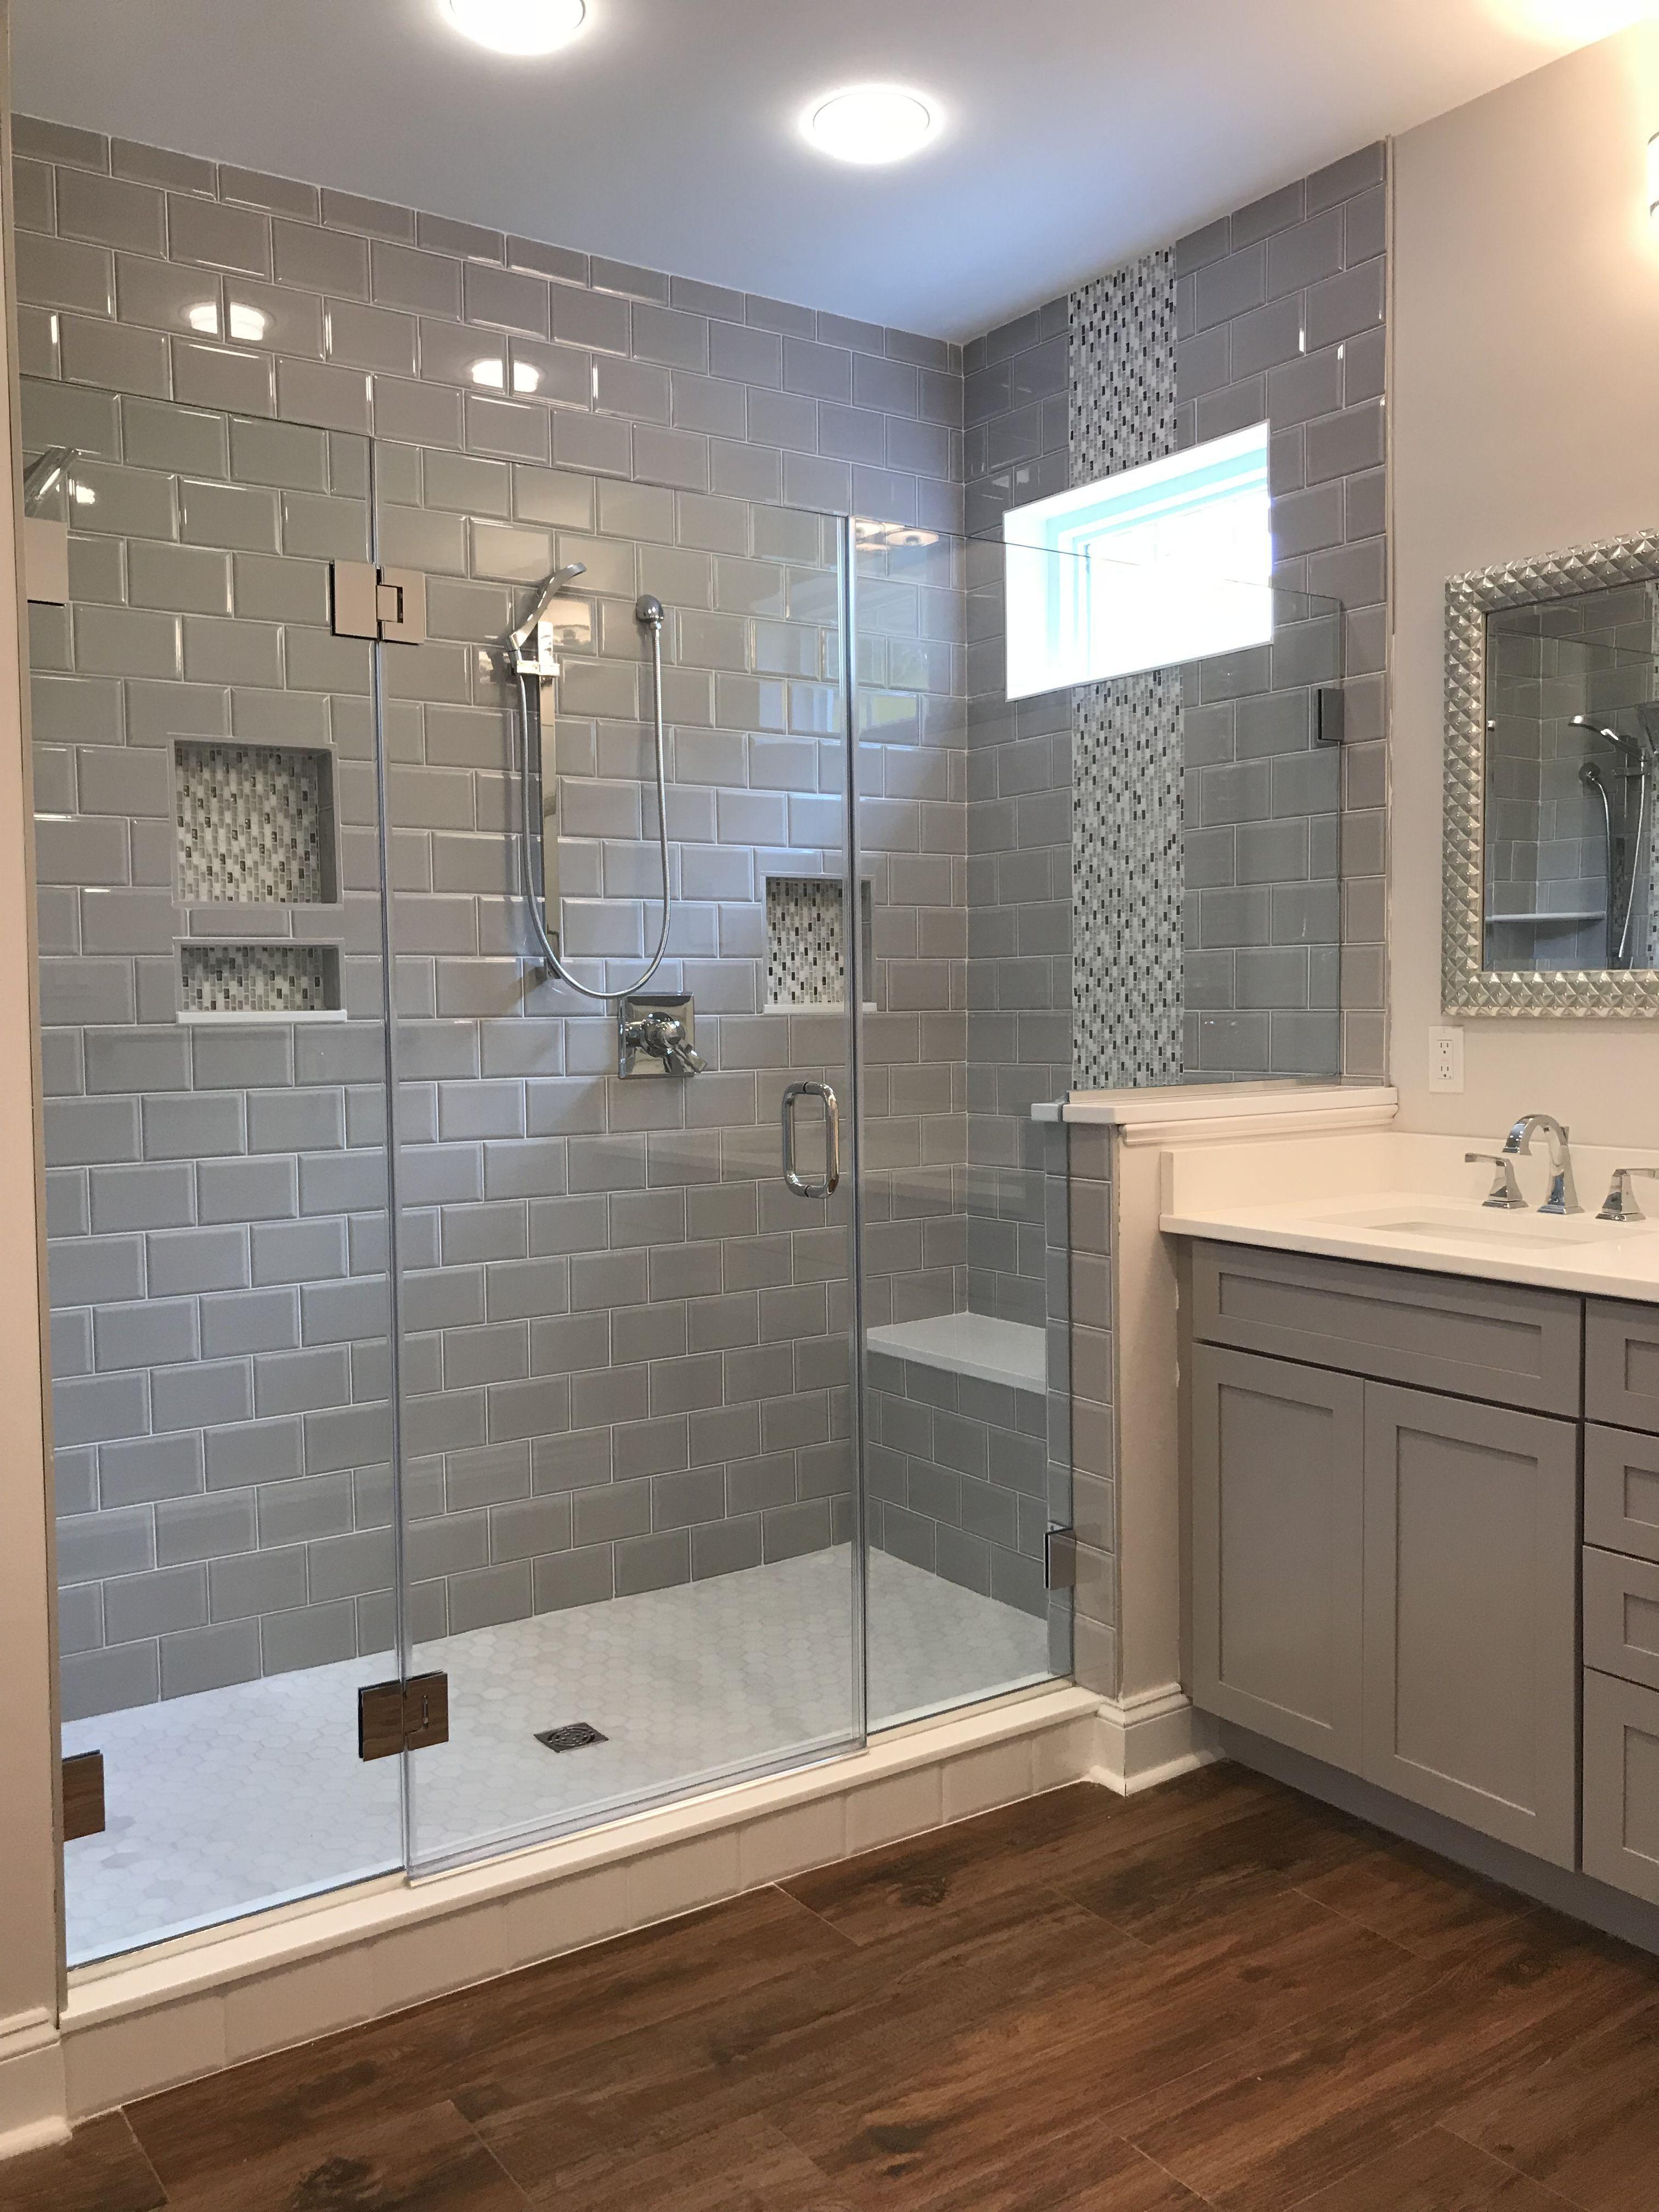 Mramornym Kafelem V Svetlyh Tonah Bathroom With Marble Tiles In Bright Colors Bathro Farmhouse Master Bathroom Small Bathroom Remodel Master Bathroom Shower